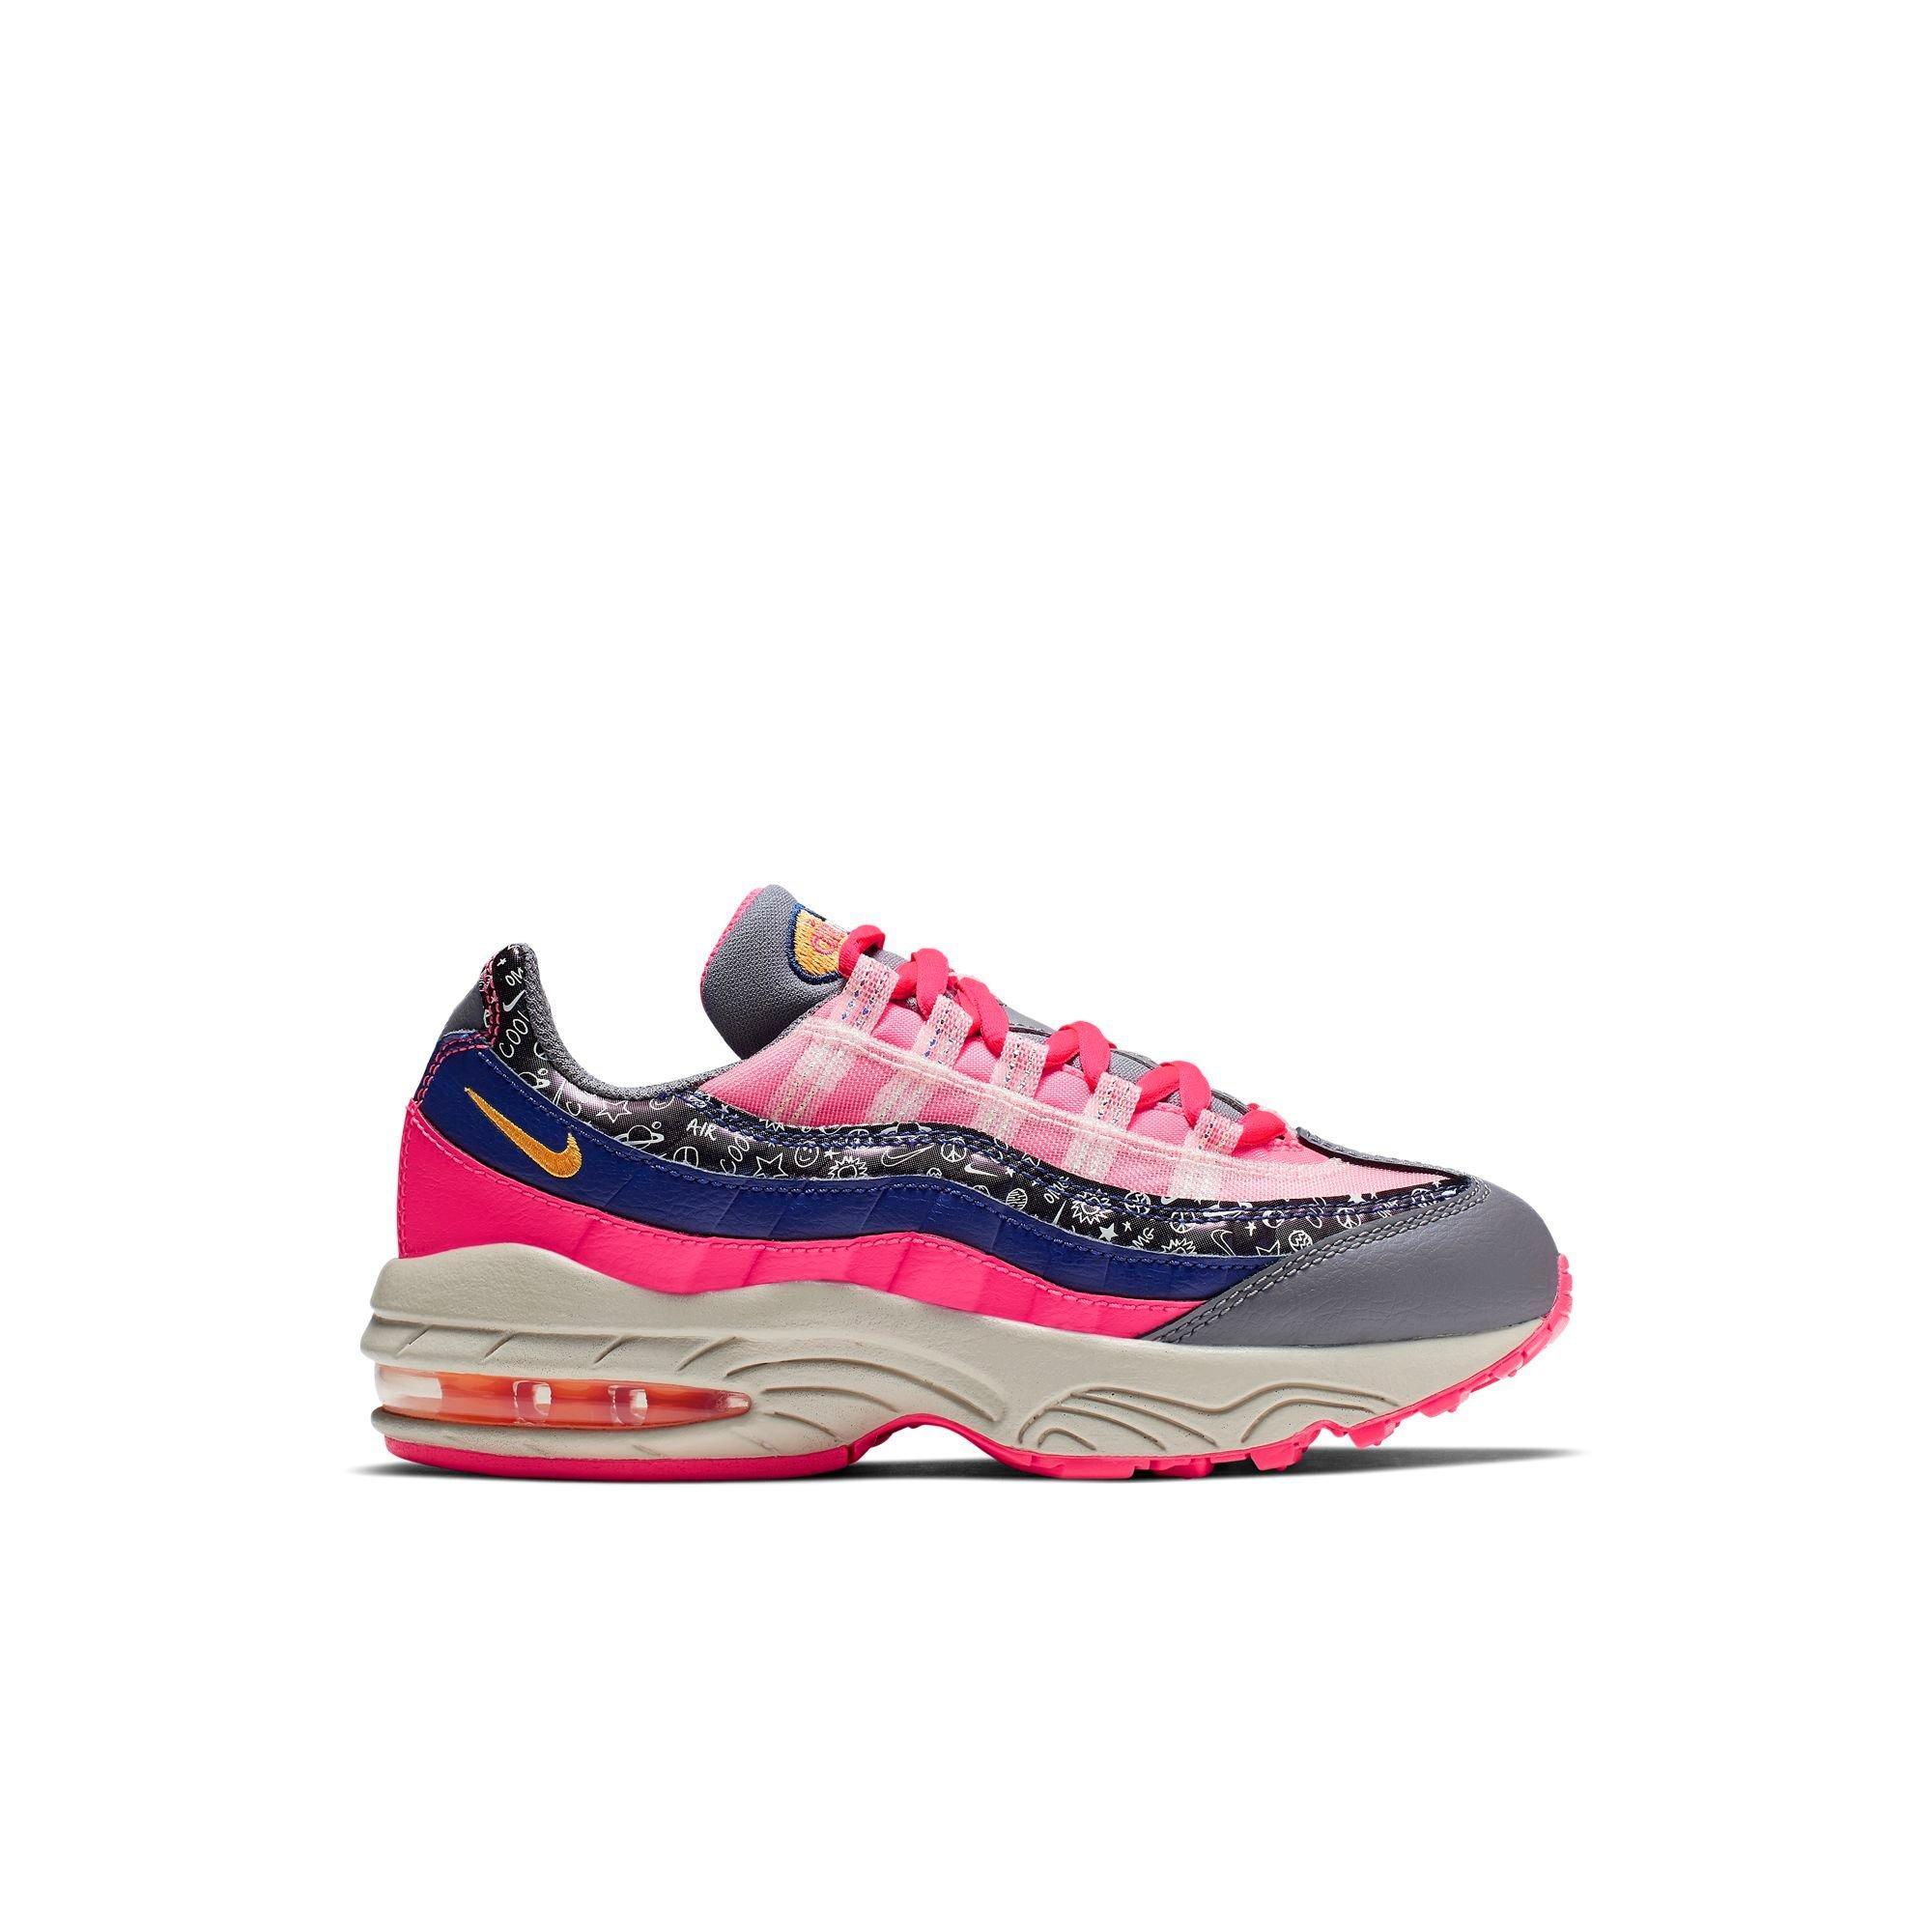 Nike Air Max 95 BlackBule Men's Lifestyle Shoes NIKE CIU013668